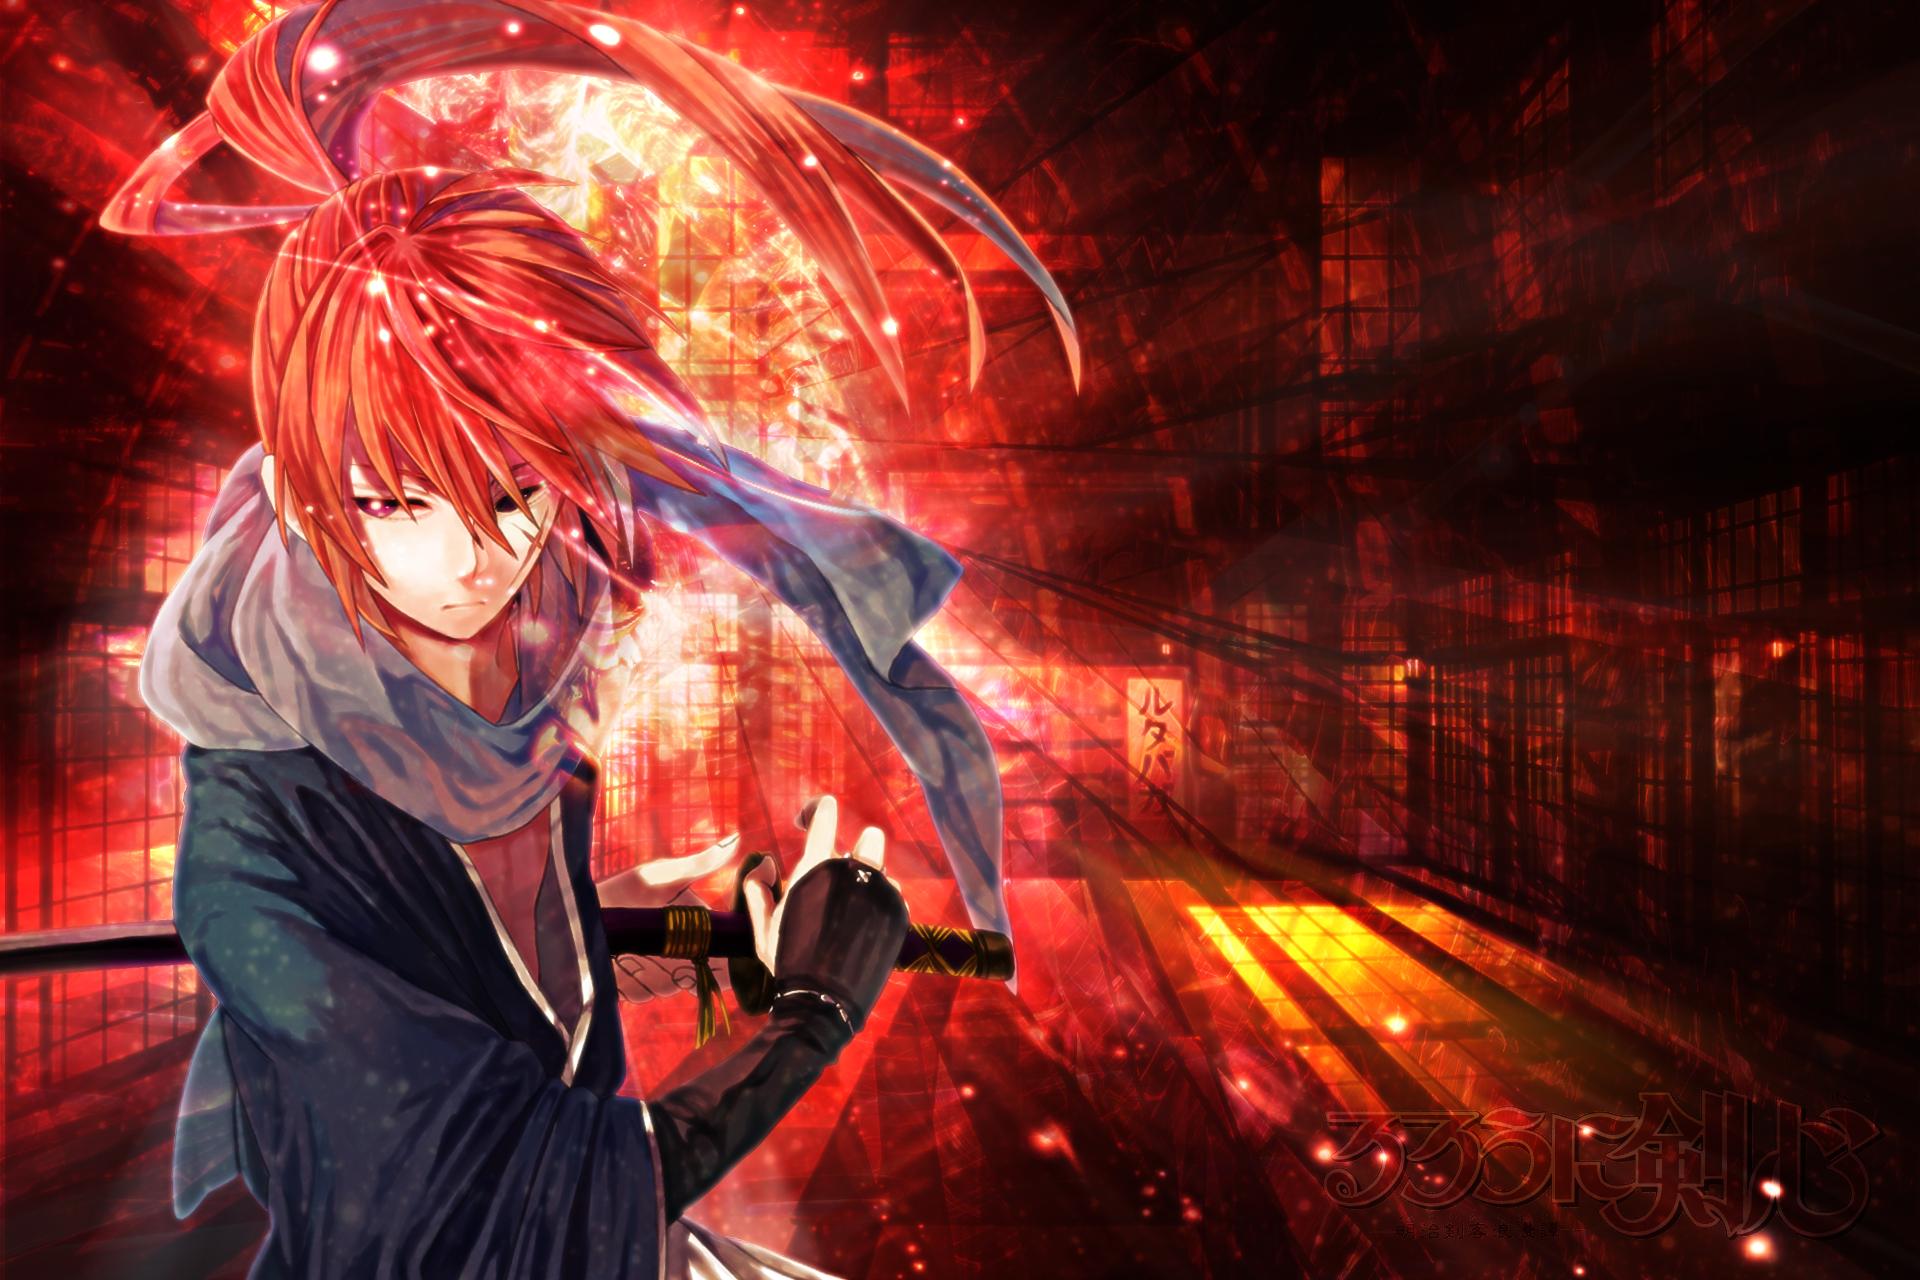 Rurouni Kenshin Wallpaper by skeptec on DeviantArt